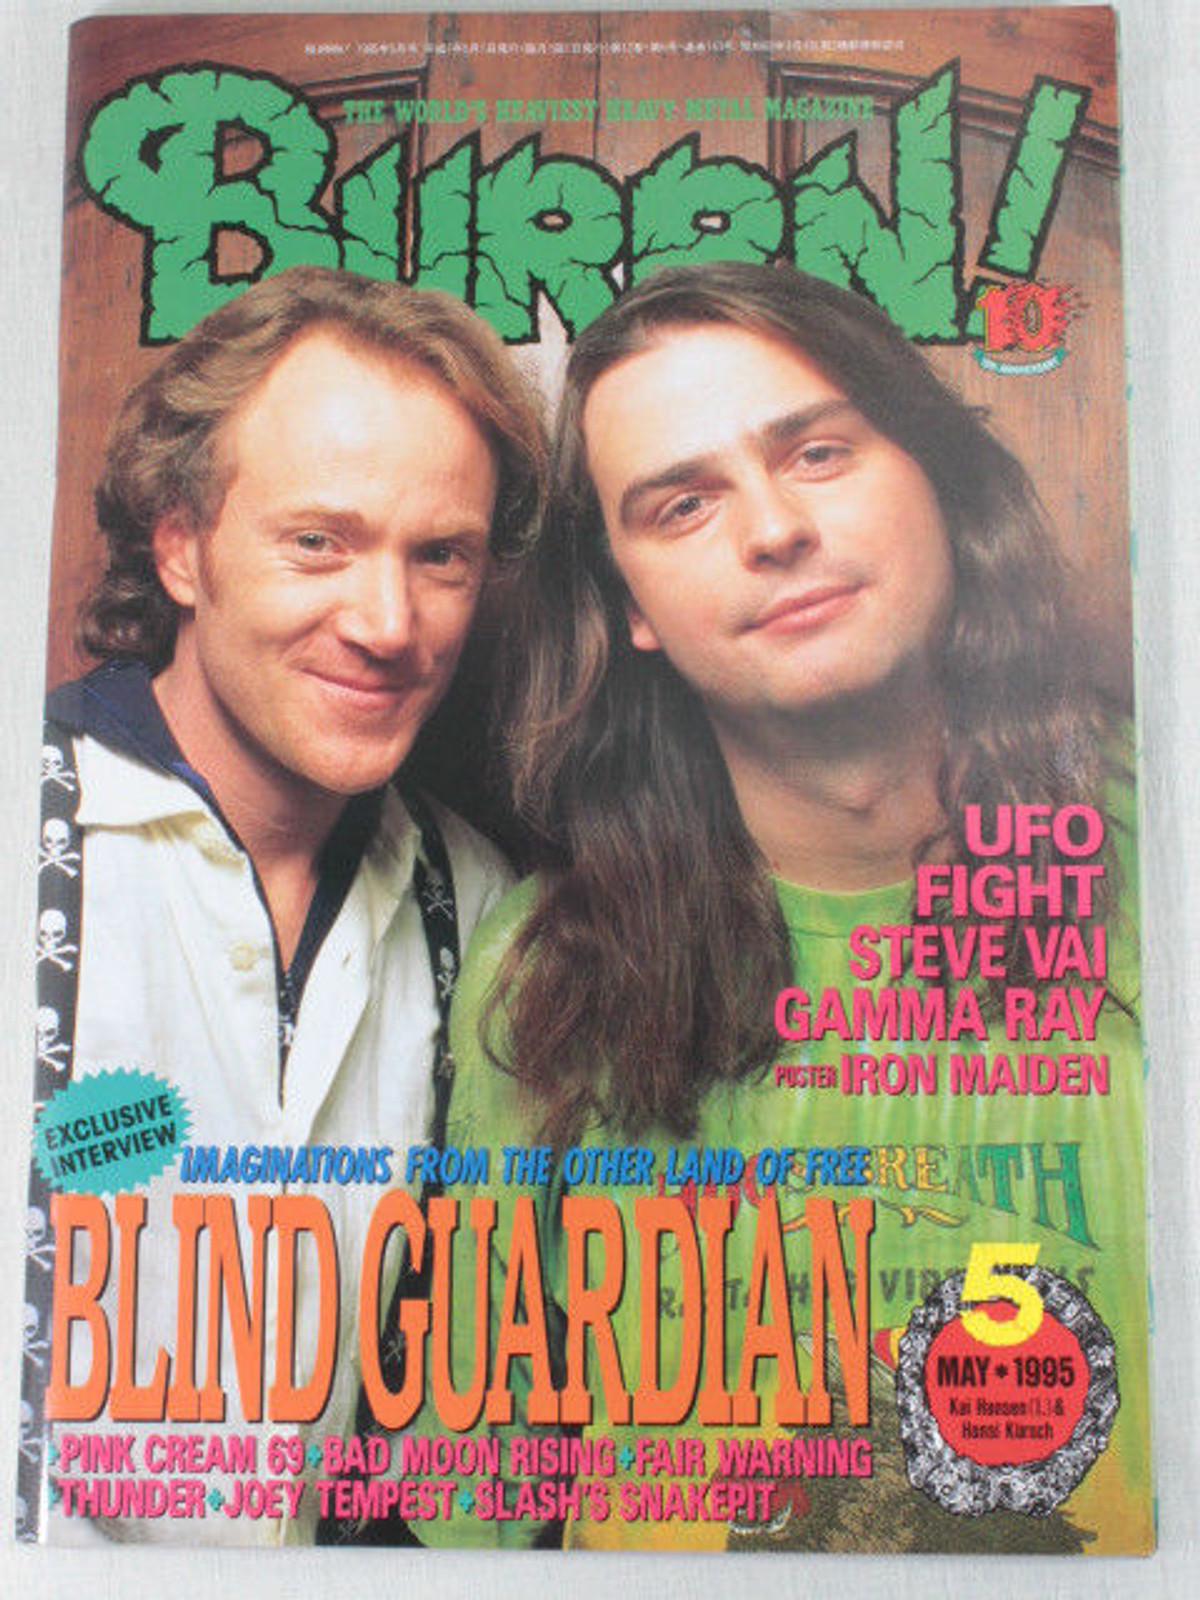 1995/05 BURRN! Japan Rock Magazine IRON MAIDEN/BLIND GUARDIAN/UFO/FIGHT/STEVEVAI